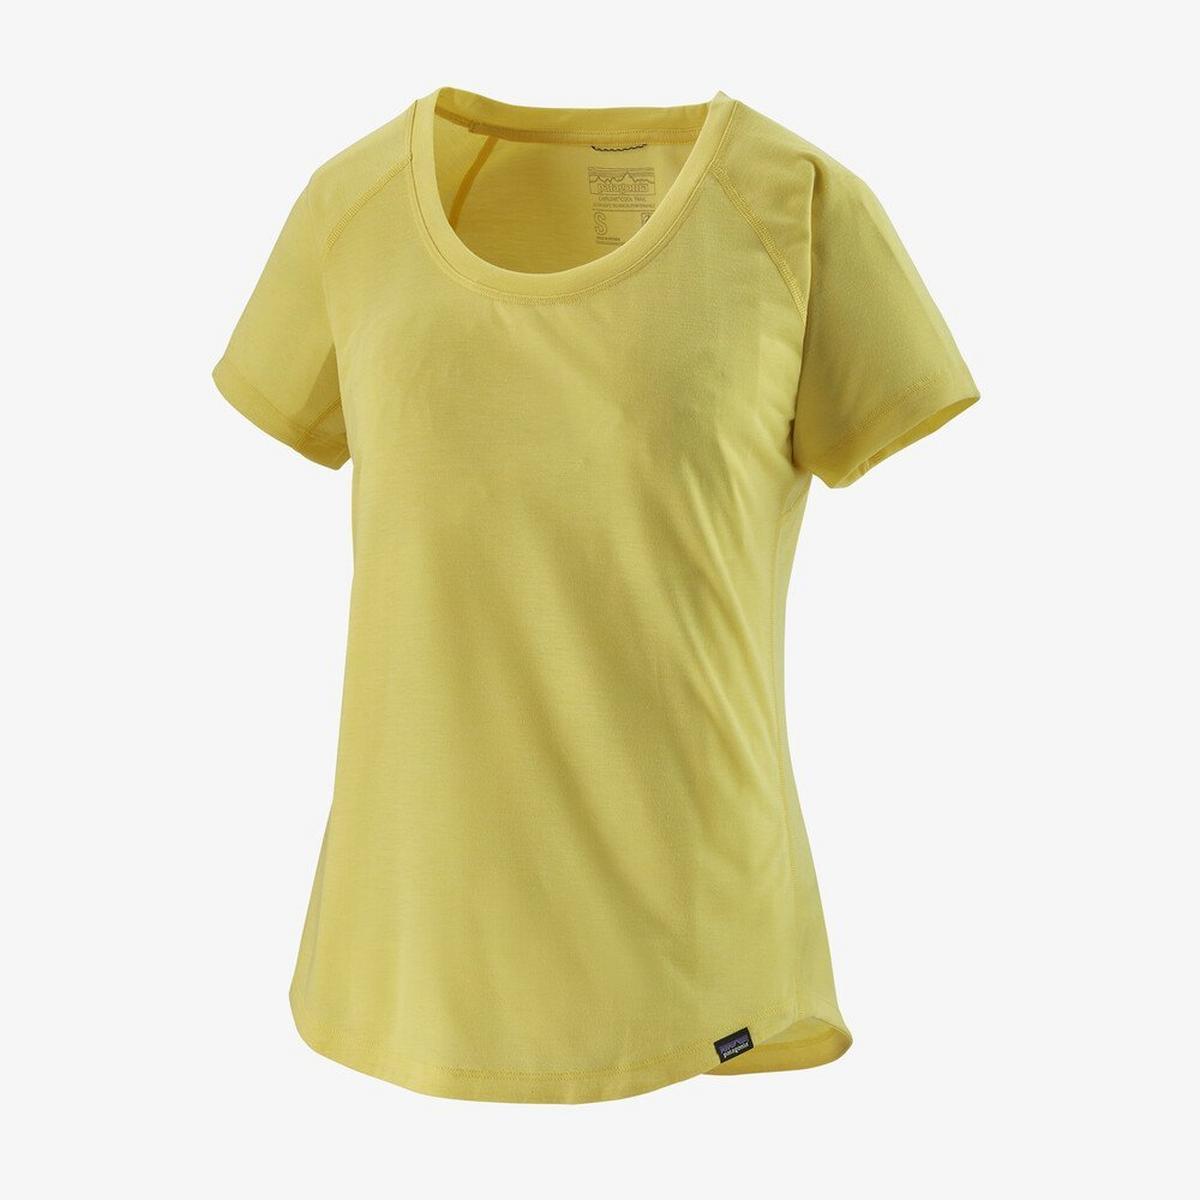 Patagonia Women's Capilene Cool Trail Shirt - Yellow